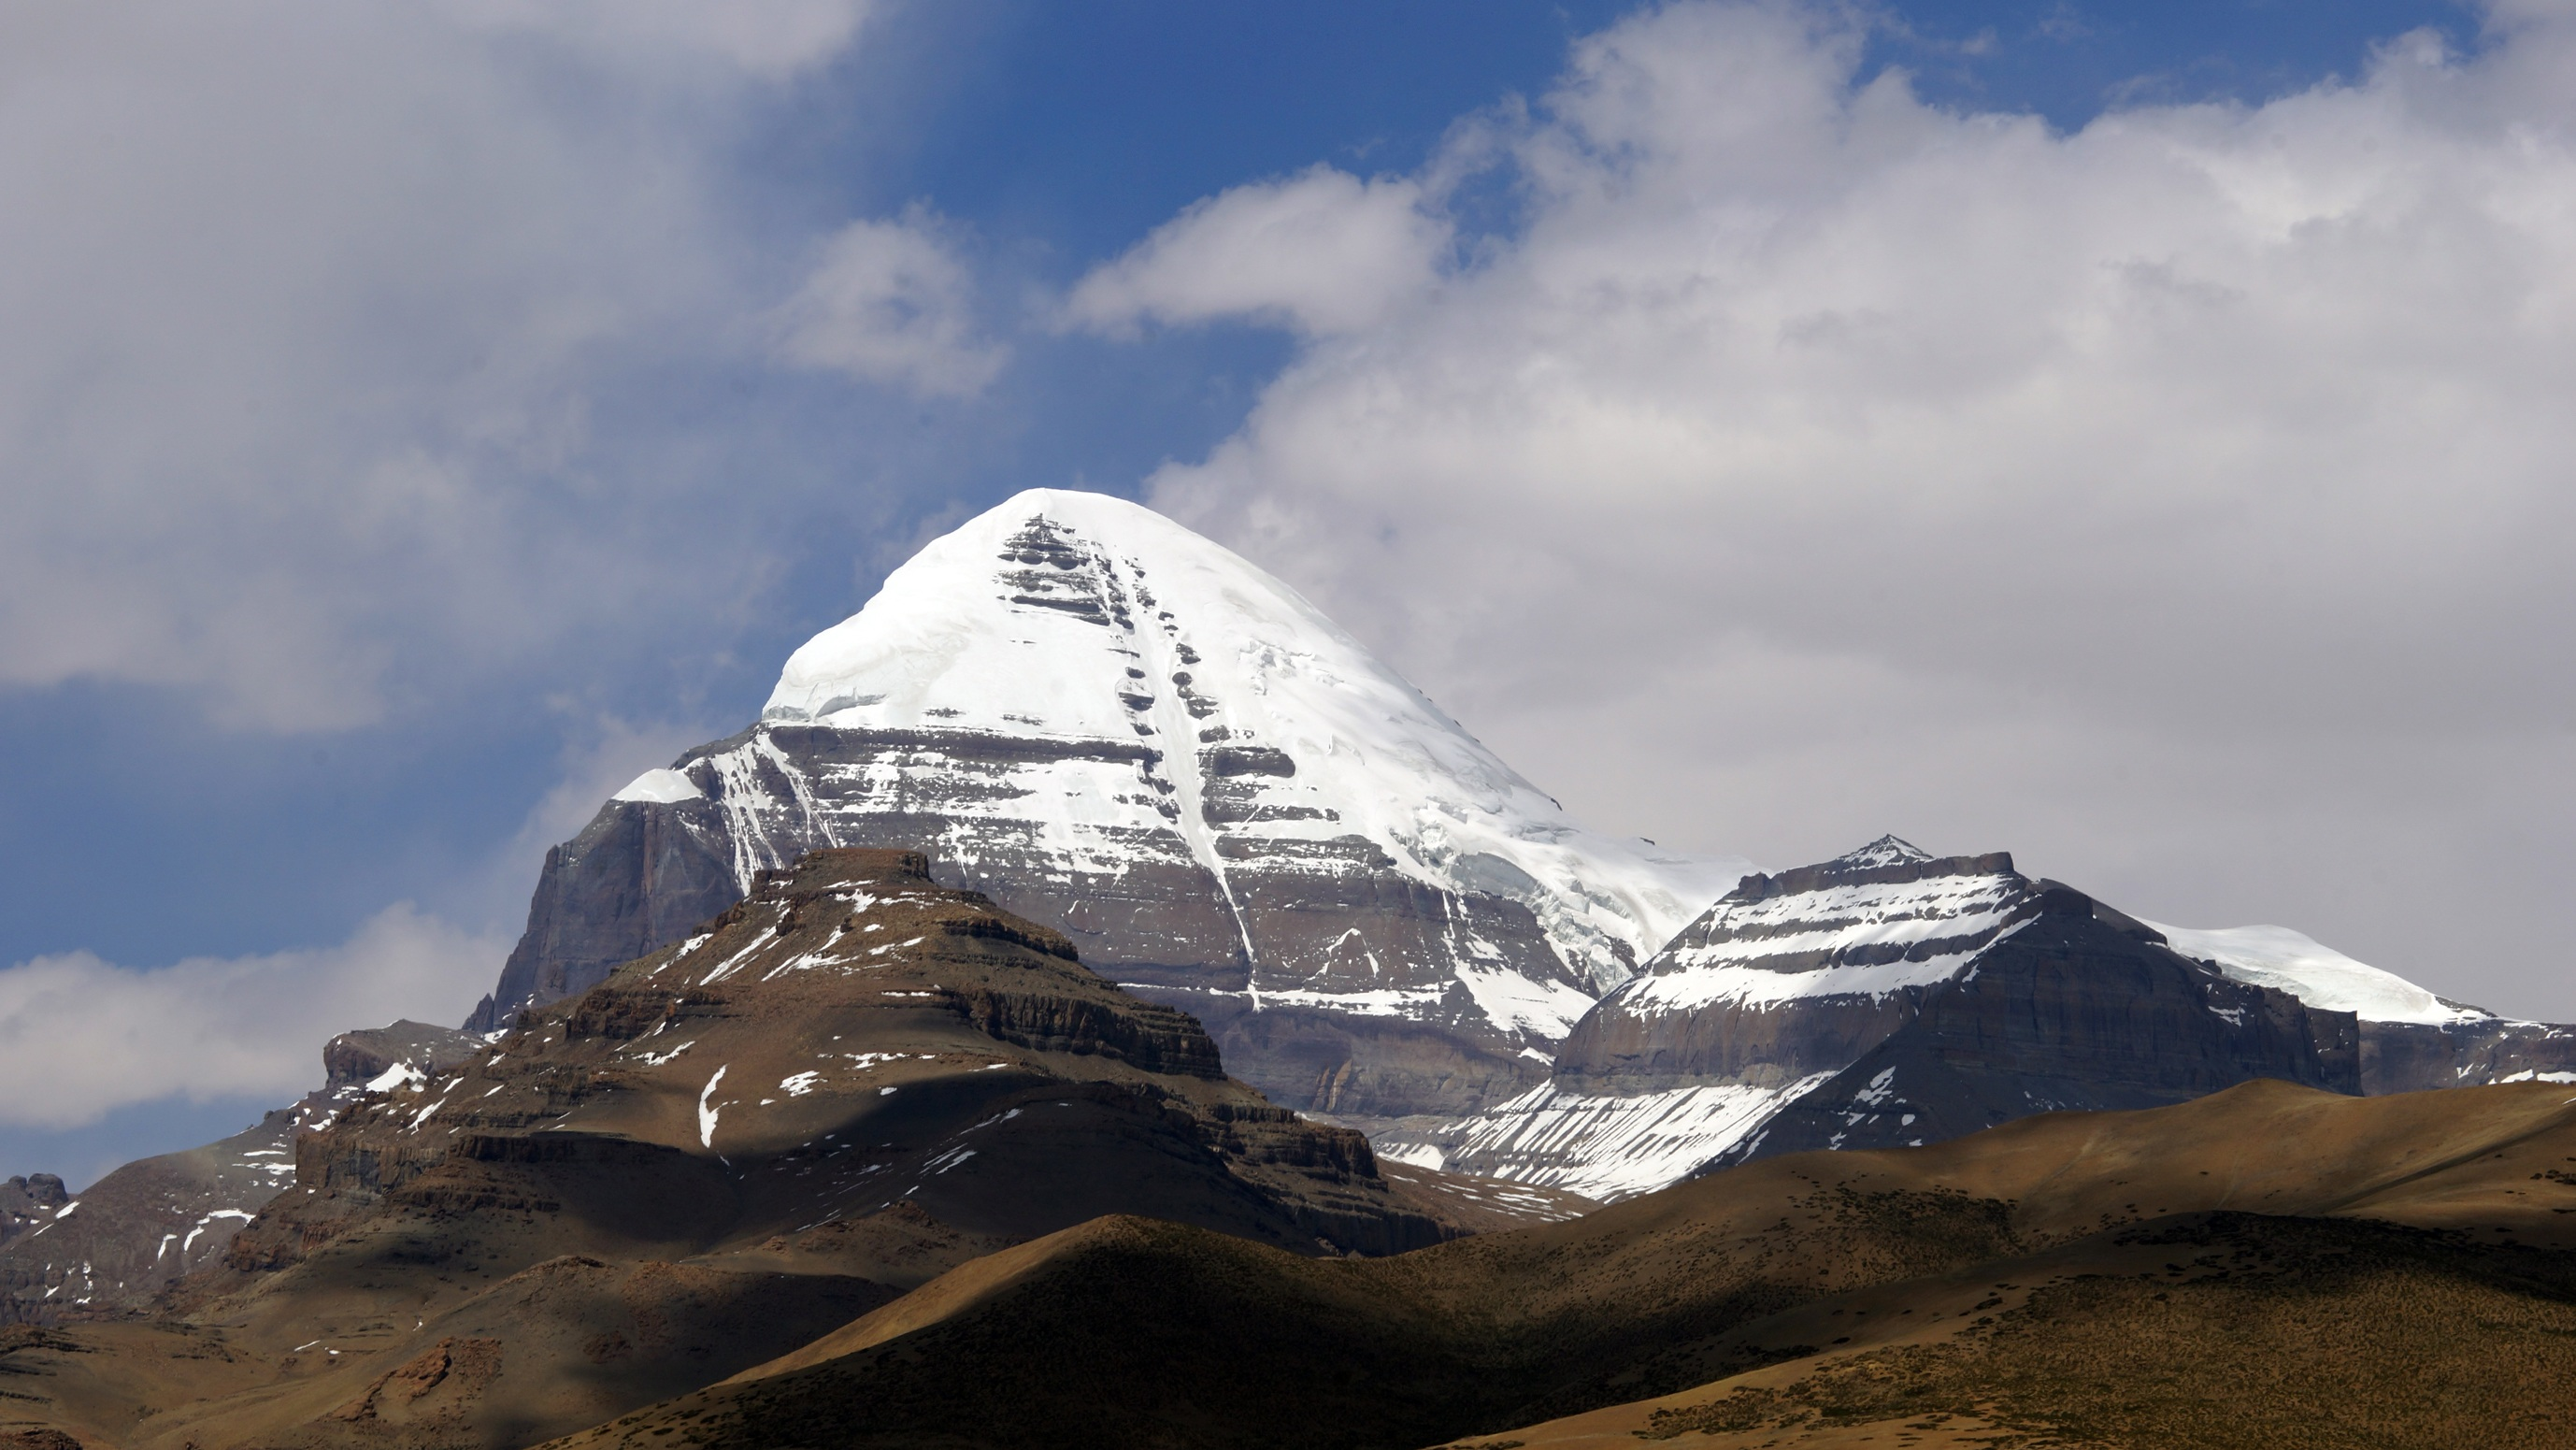 Kailash Manasarovar & Guge Kingdom Exploration Tour - Mount Kailash, Tibet